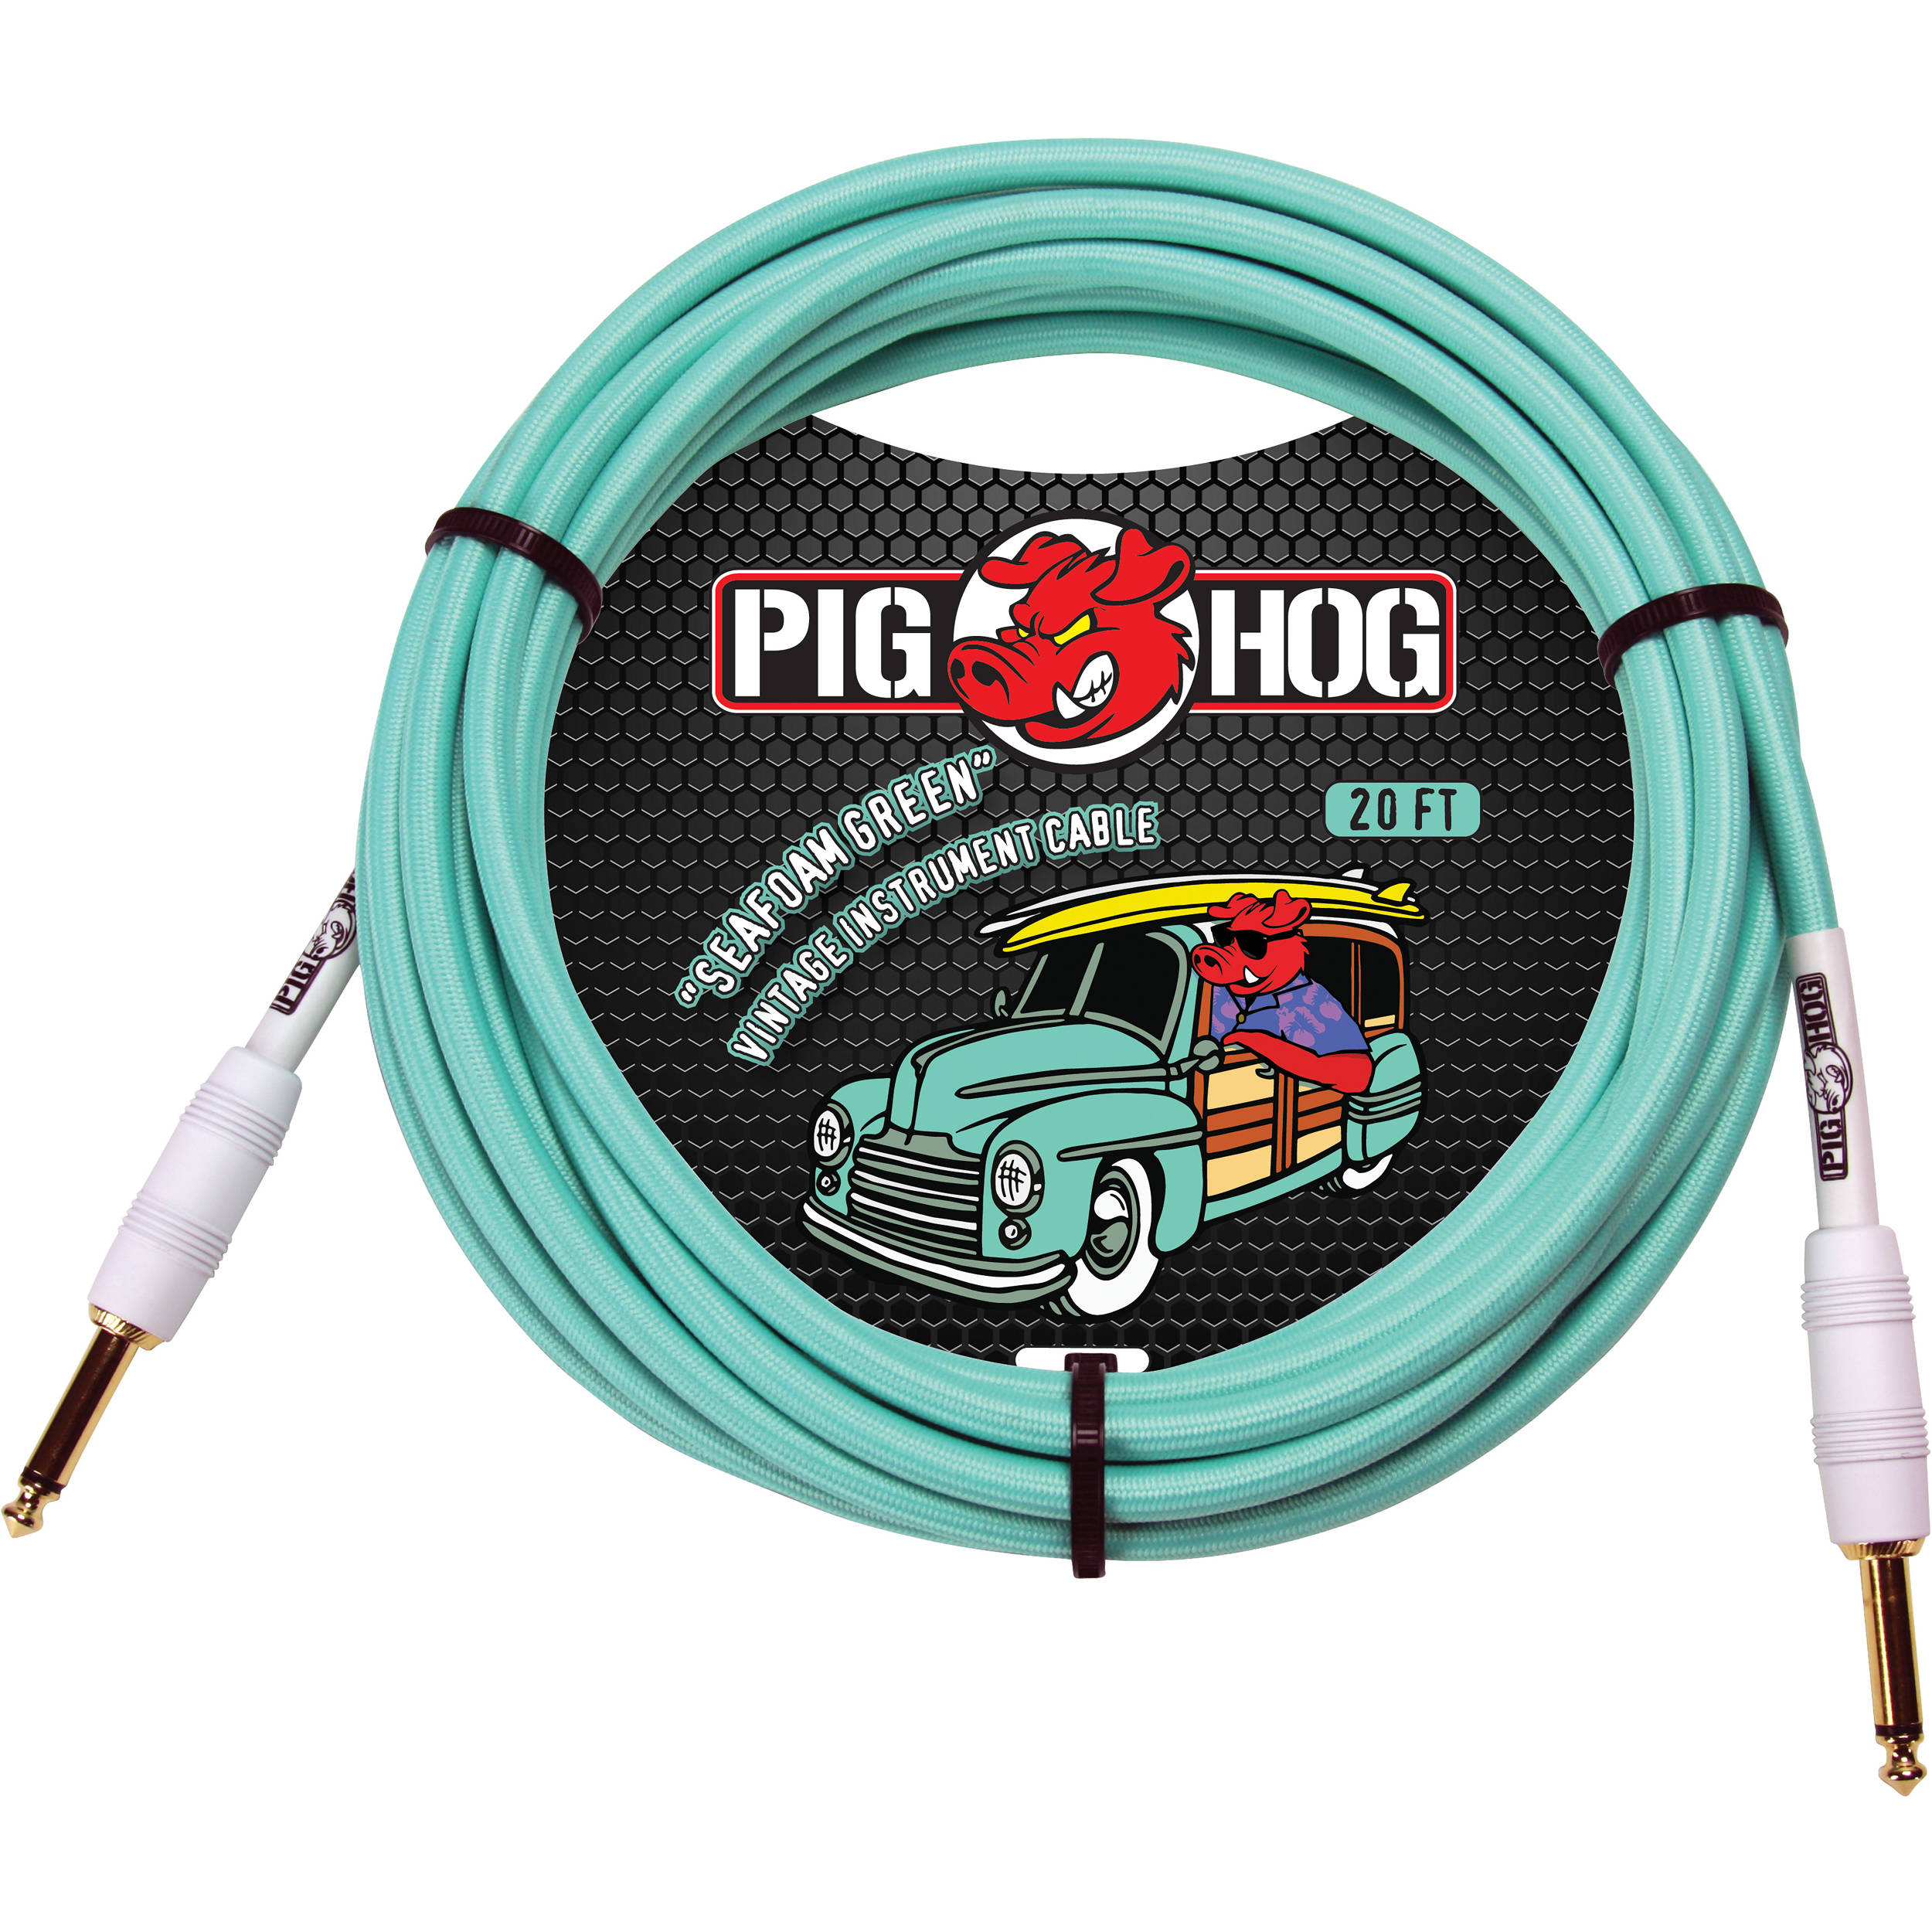 Pig Hog Vintage Series Woven Instrument Cable Pch20sg B Amp H